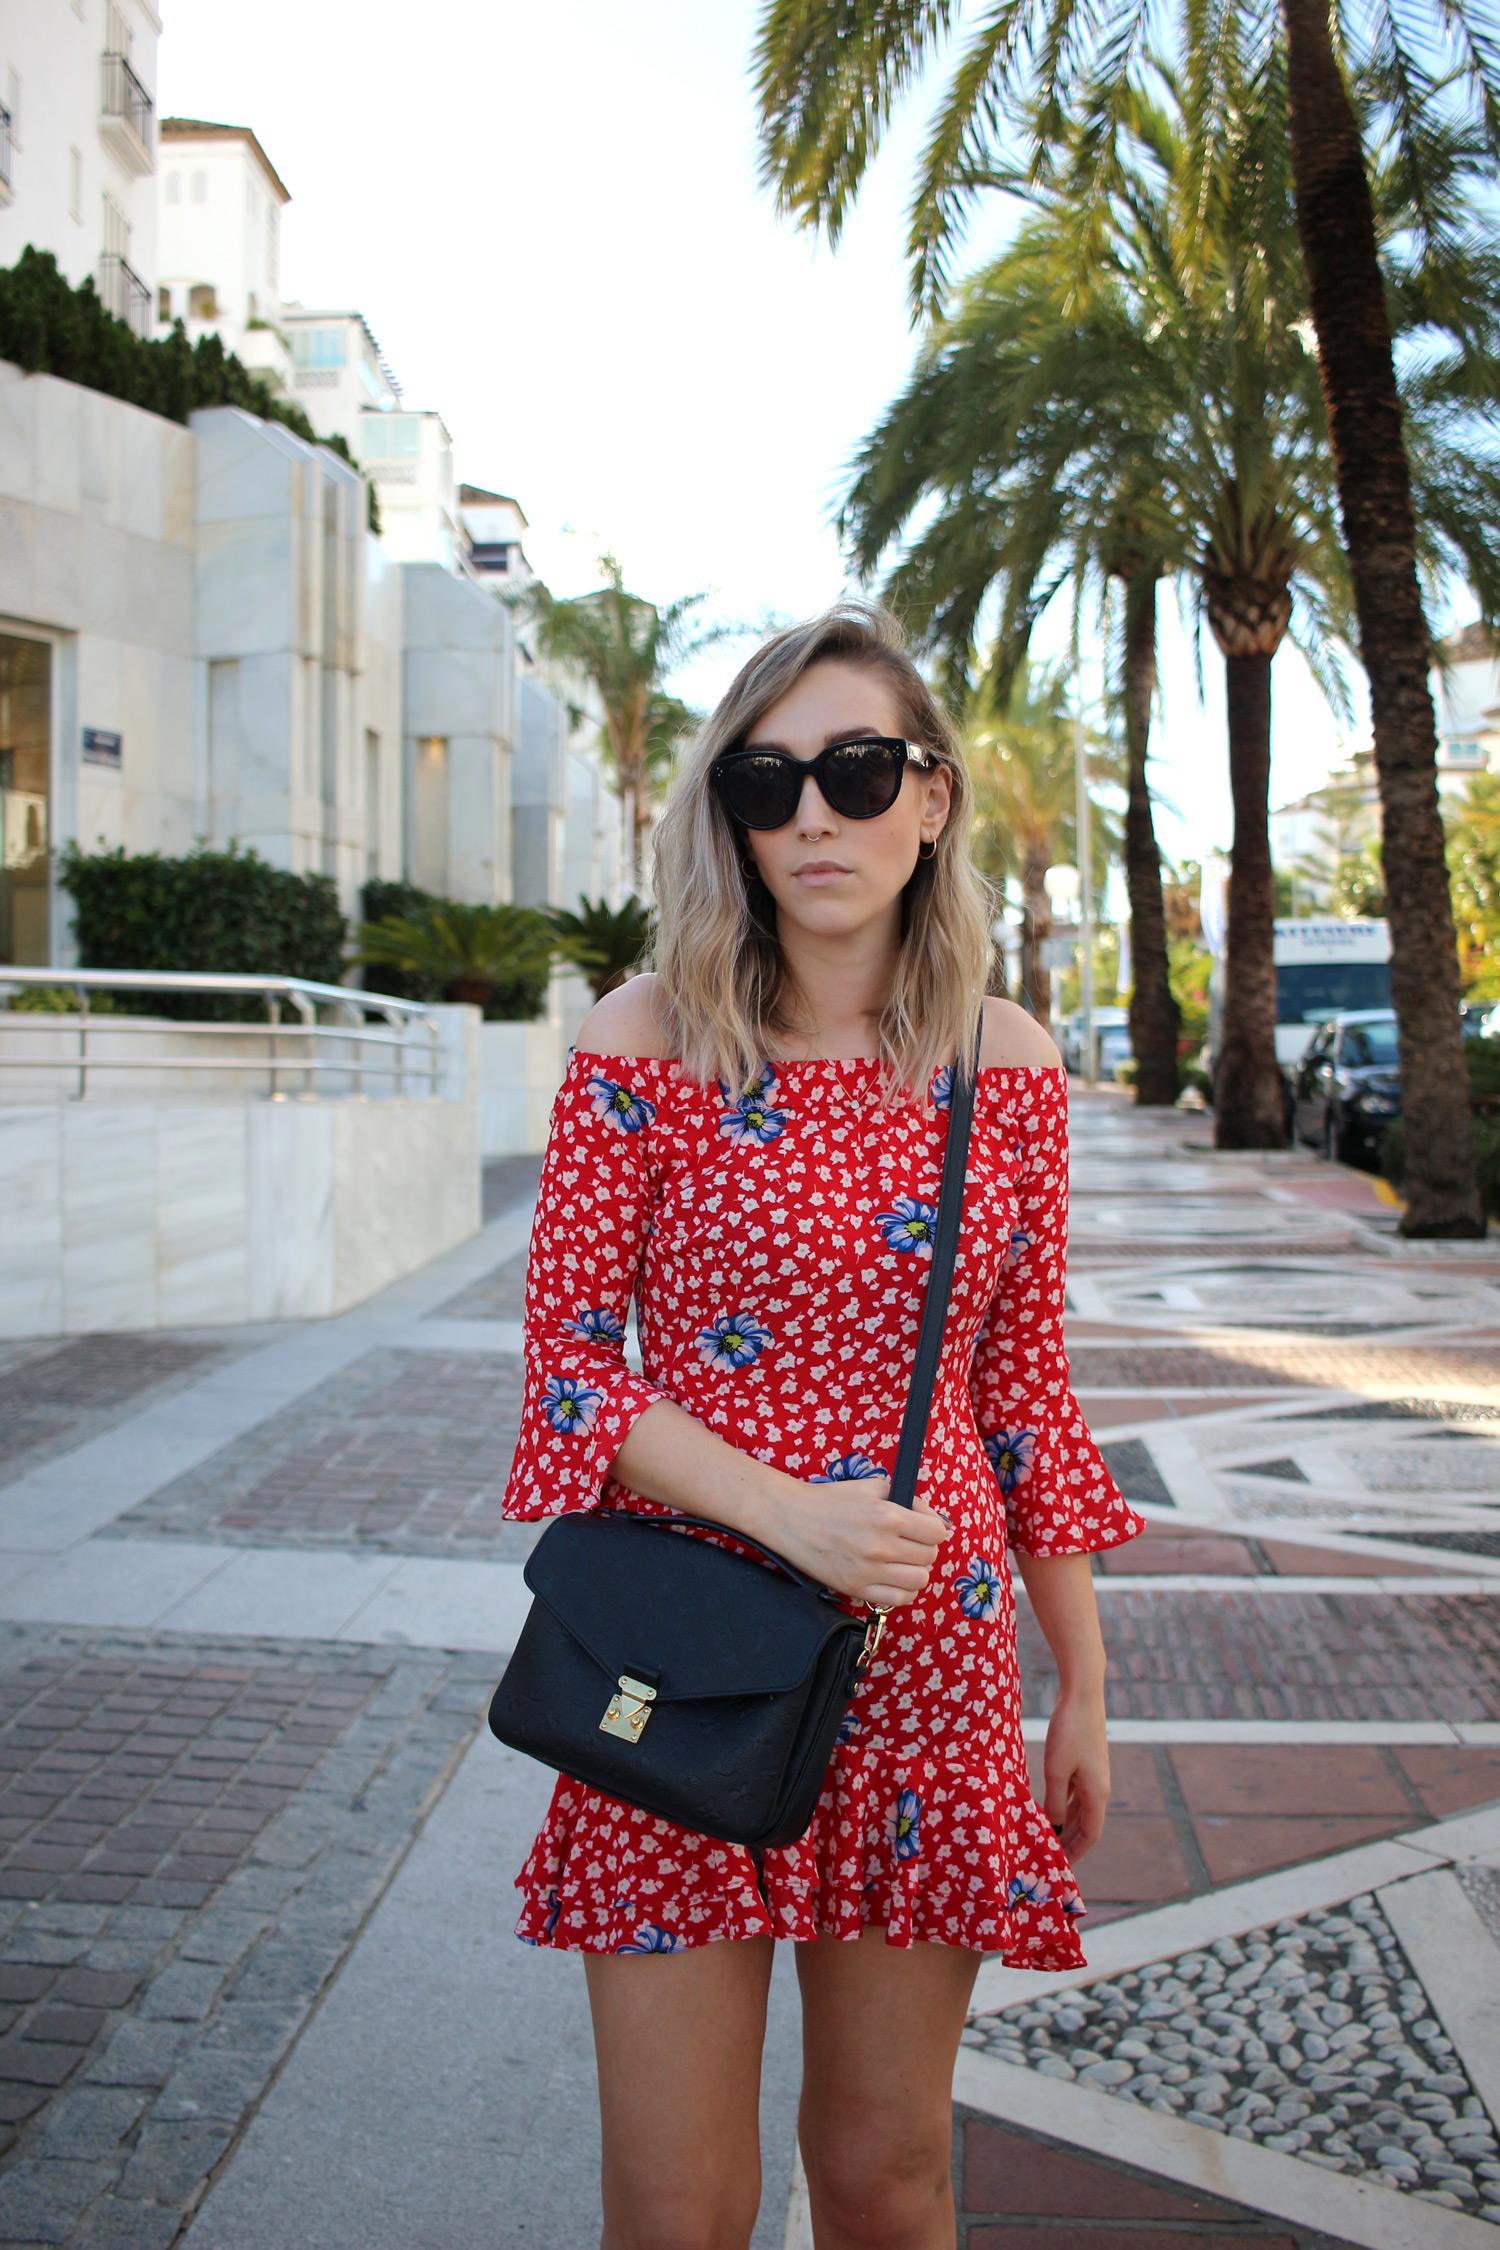 marbella-malaga-spain-travel-blogger-Puerto-Banus-2